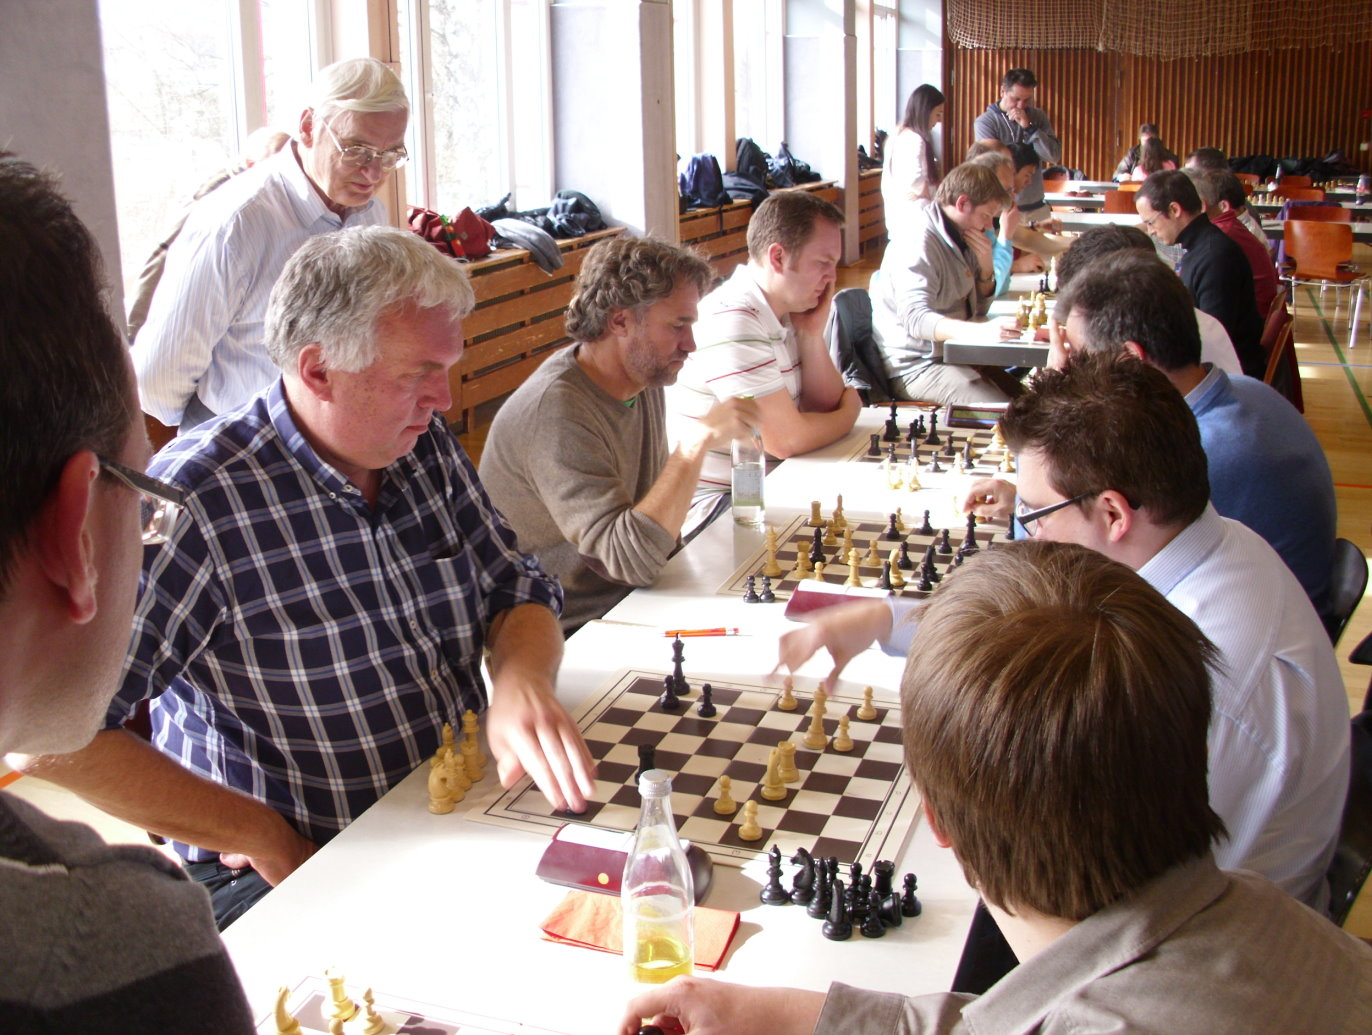 WMBM2015-SG Turm Albstadt-SKL-Runde 11